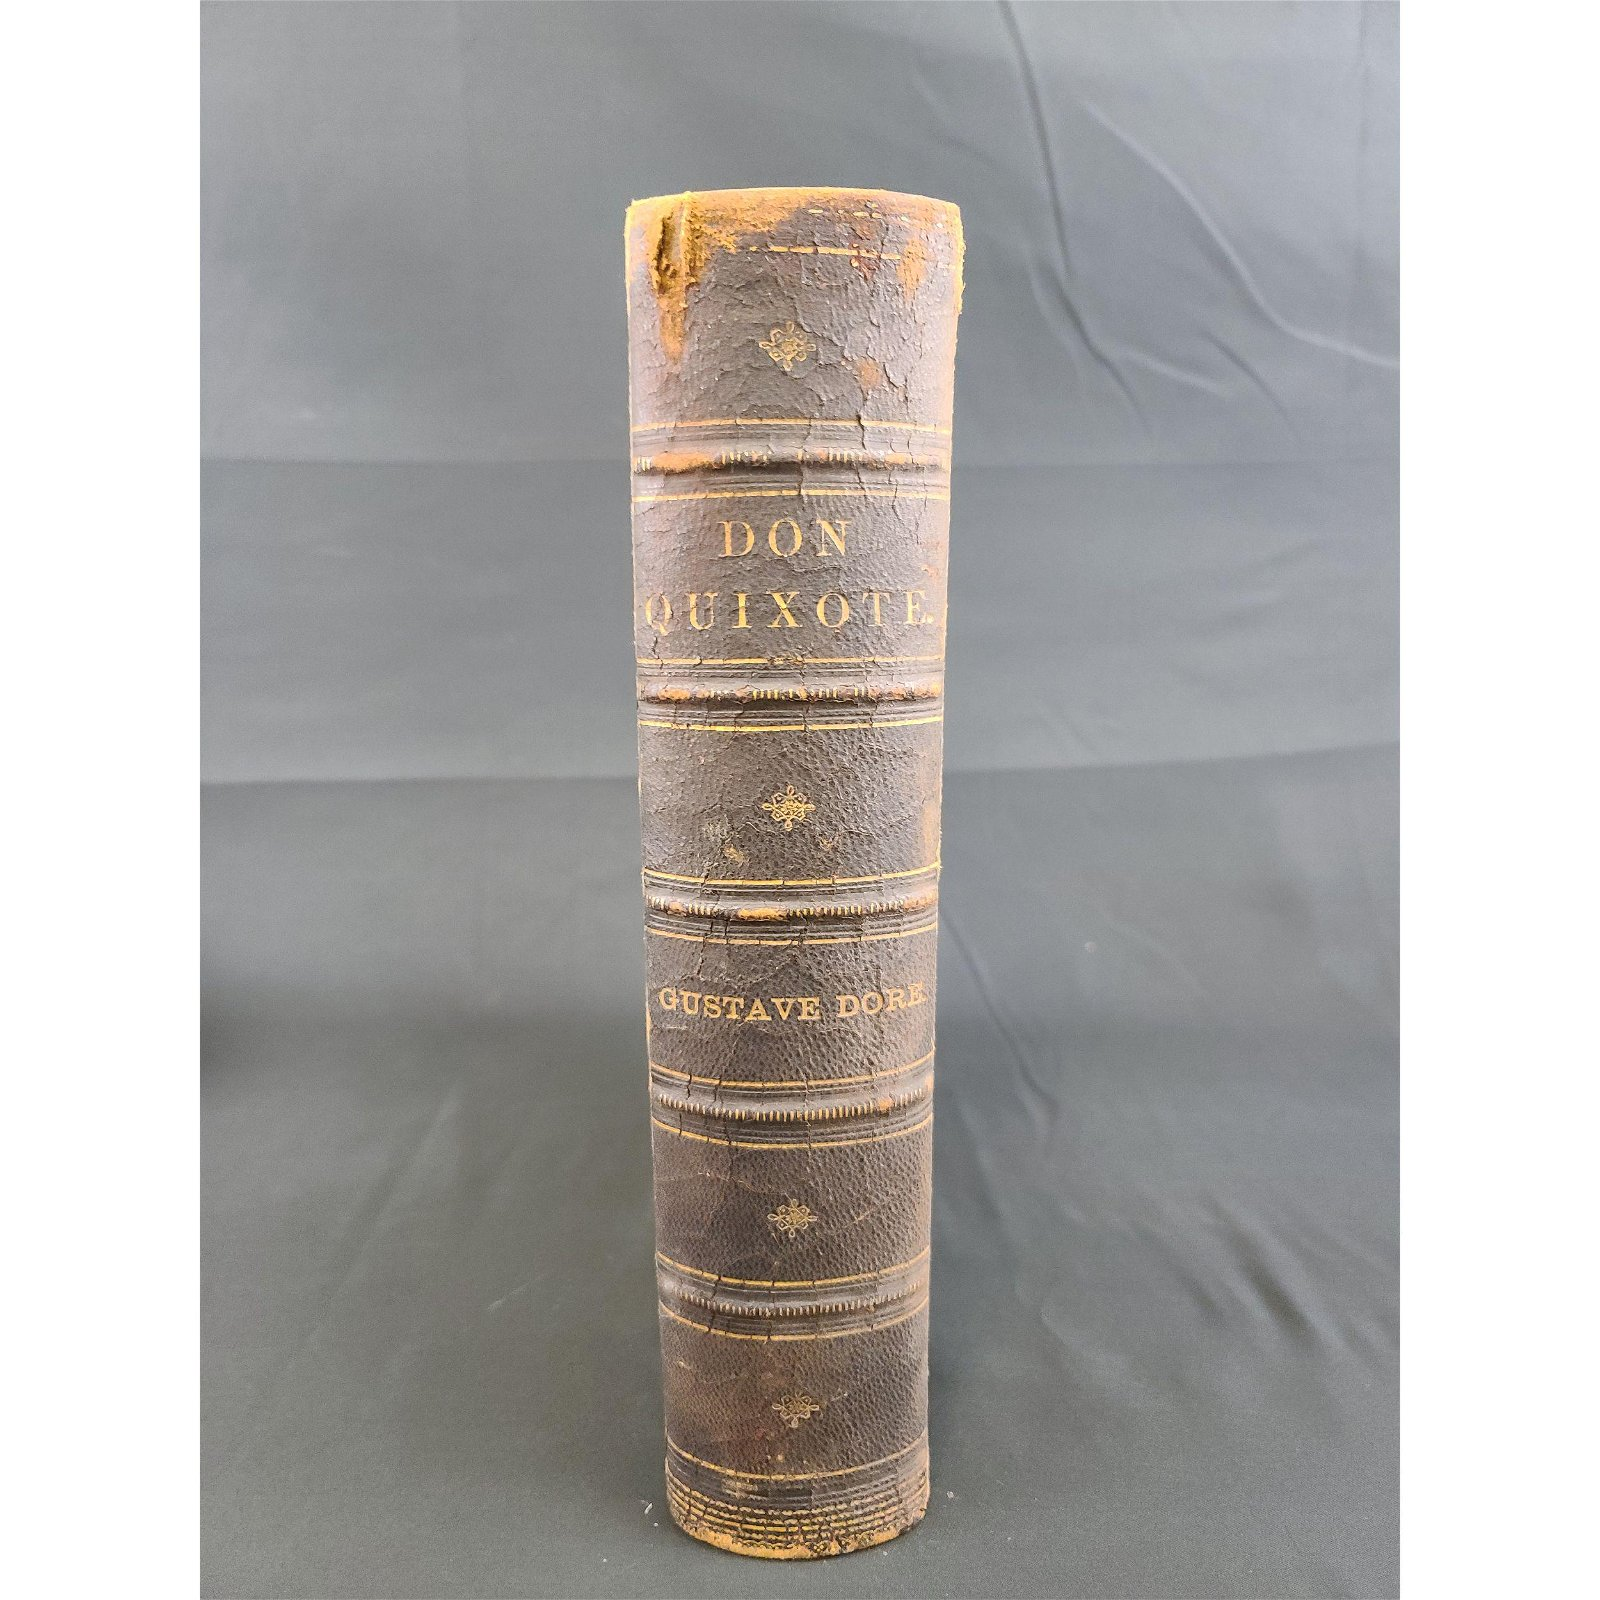 "Antique Book 19th C 'The History of Don Quixote"""